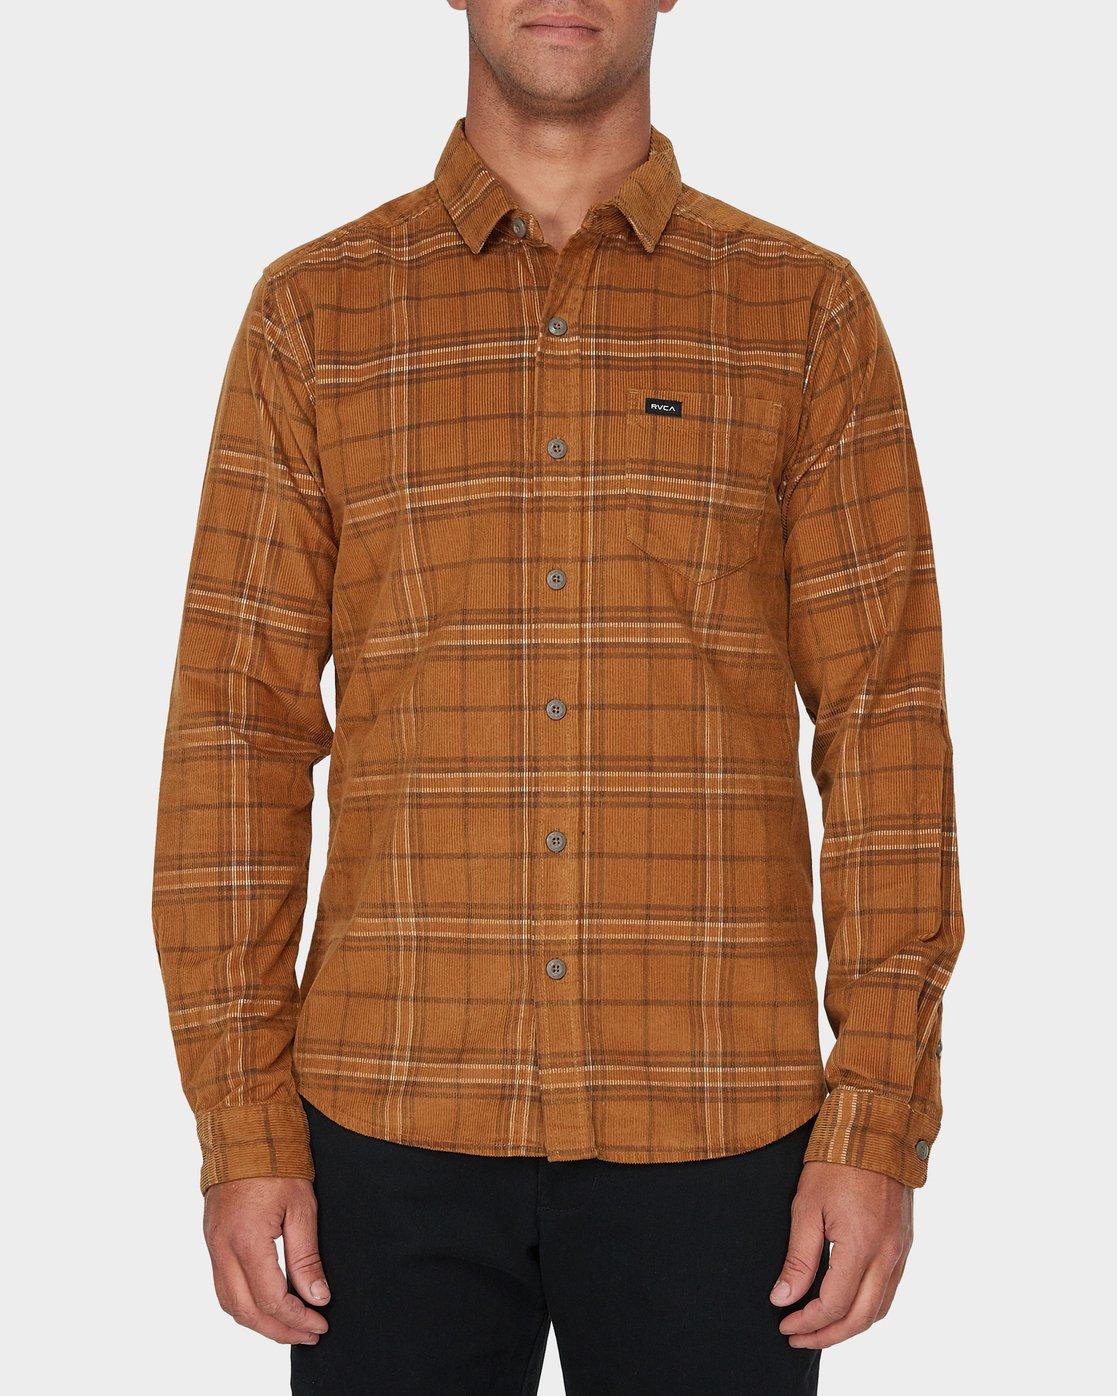 0 Phases Plaid Cord Long Sleeve Shirt Brown R393201 RVCA